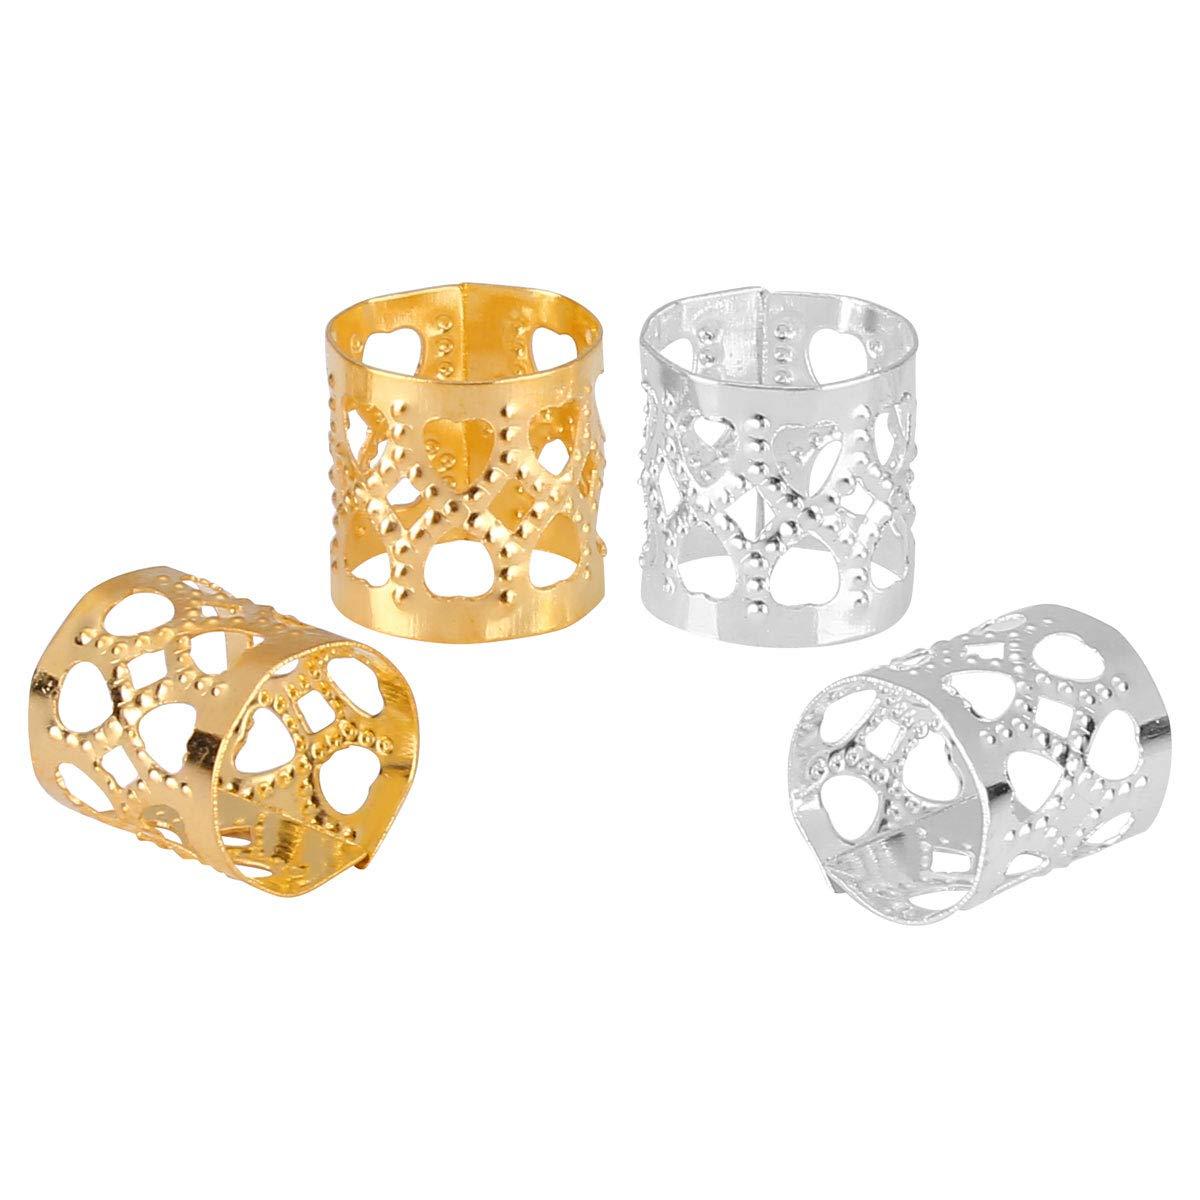 20pcs-50pcs Acrylic different 5 styles hair braid dread dreadlock beads clips cuffs tube rings Jewelry dreadlock accessories